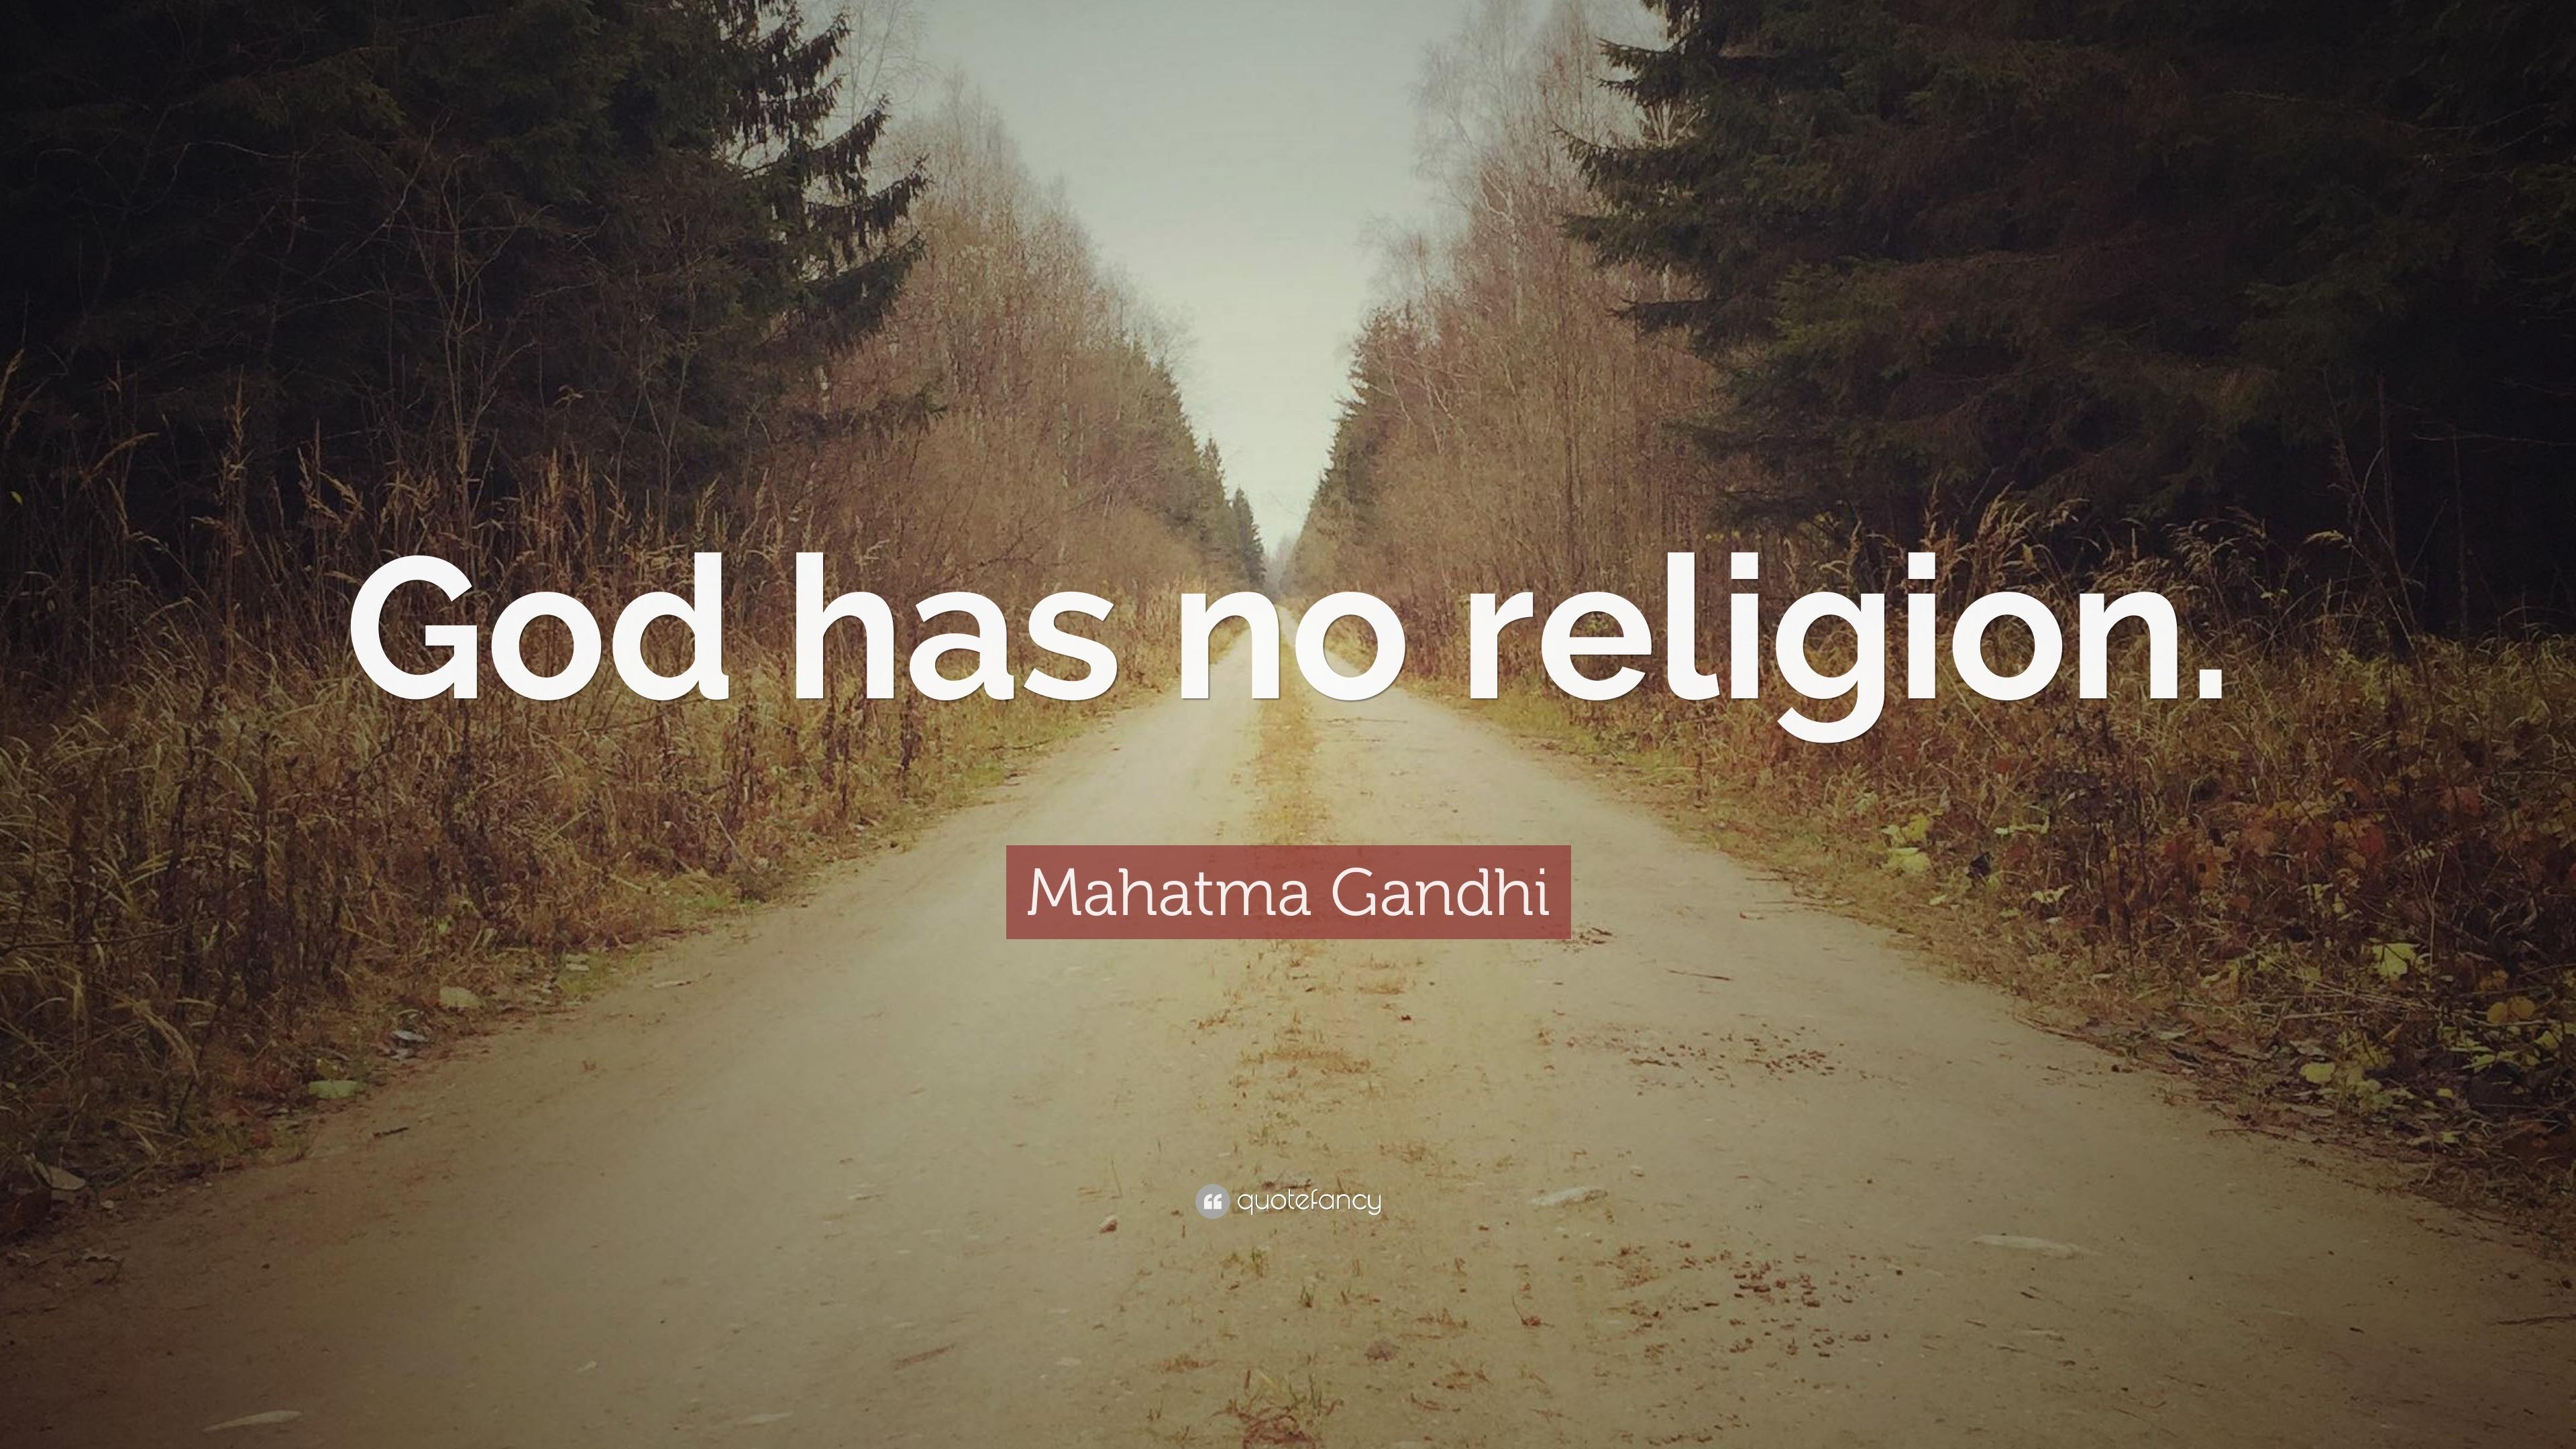 Mahatma Gandhi Quote God Has No Religion Wallpapers - Gandhi religion